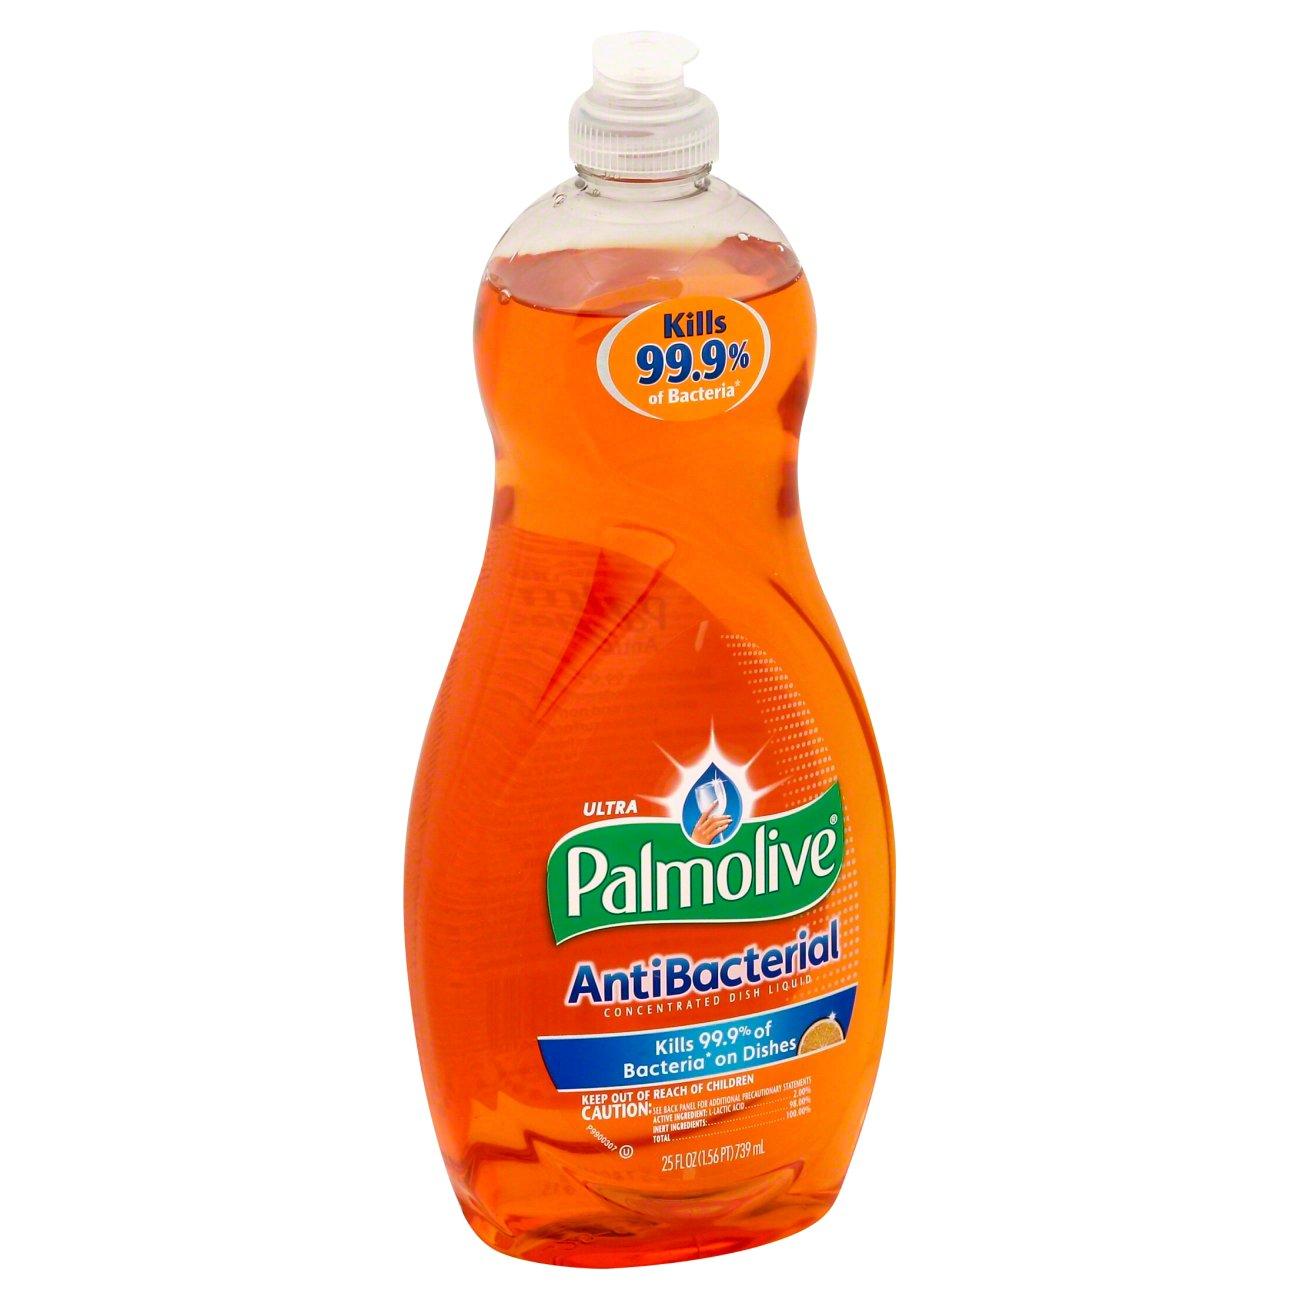 Palmolive<sup>&reg;</sup> Ultra Dish Liquid Antibacterial